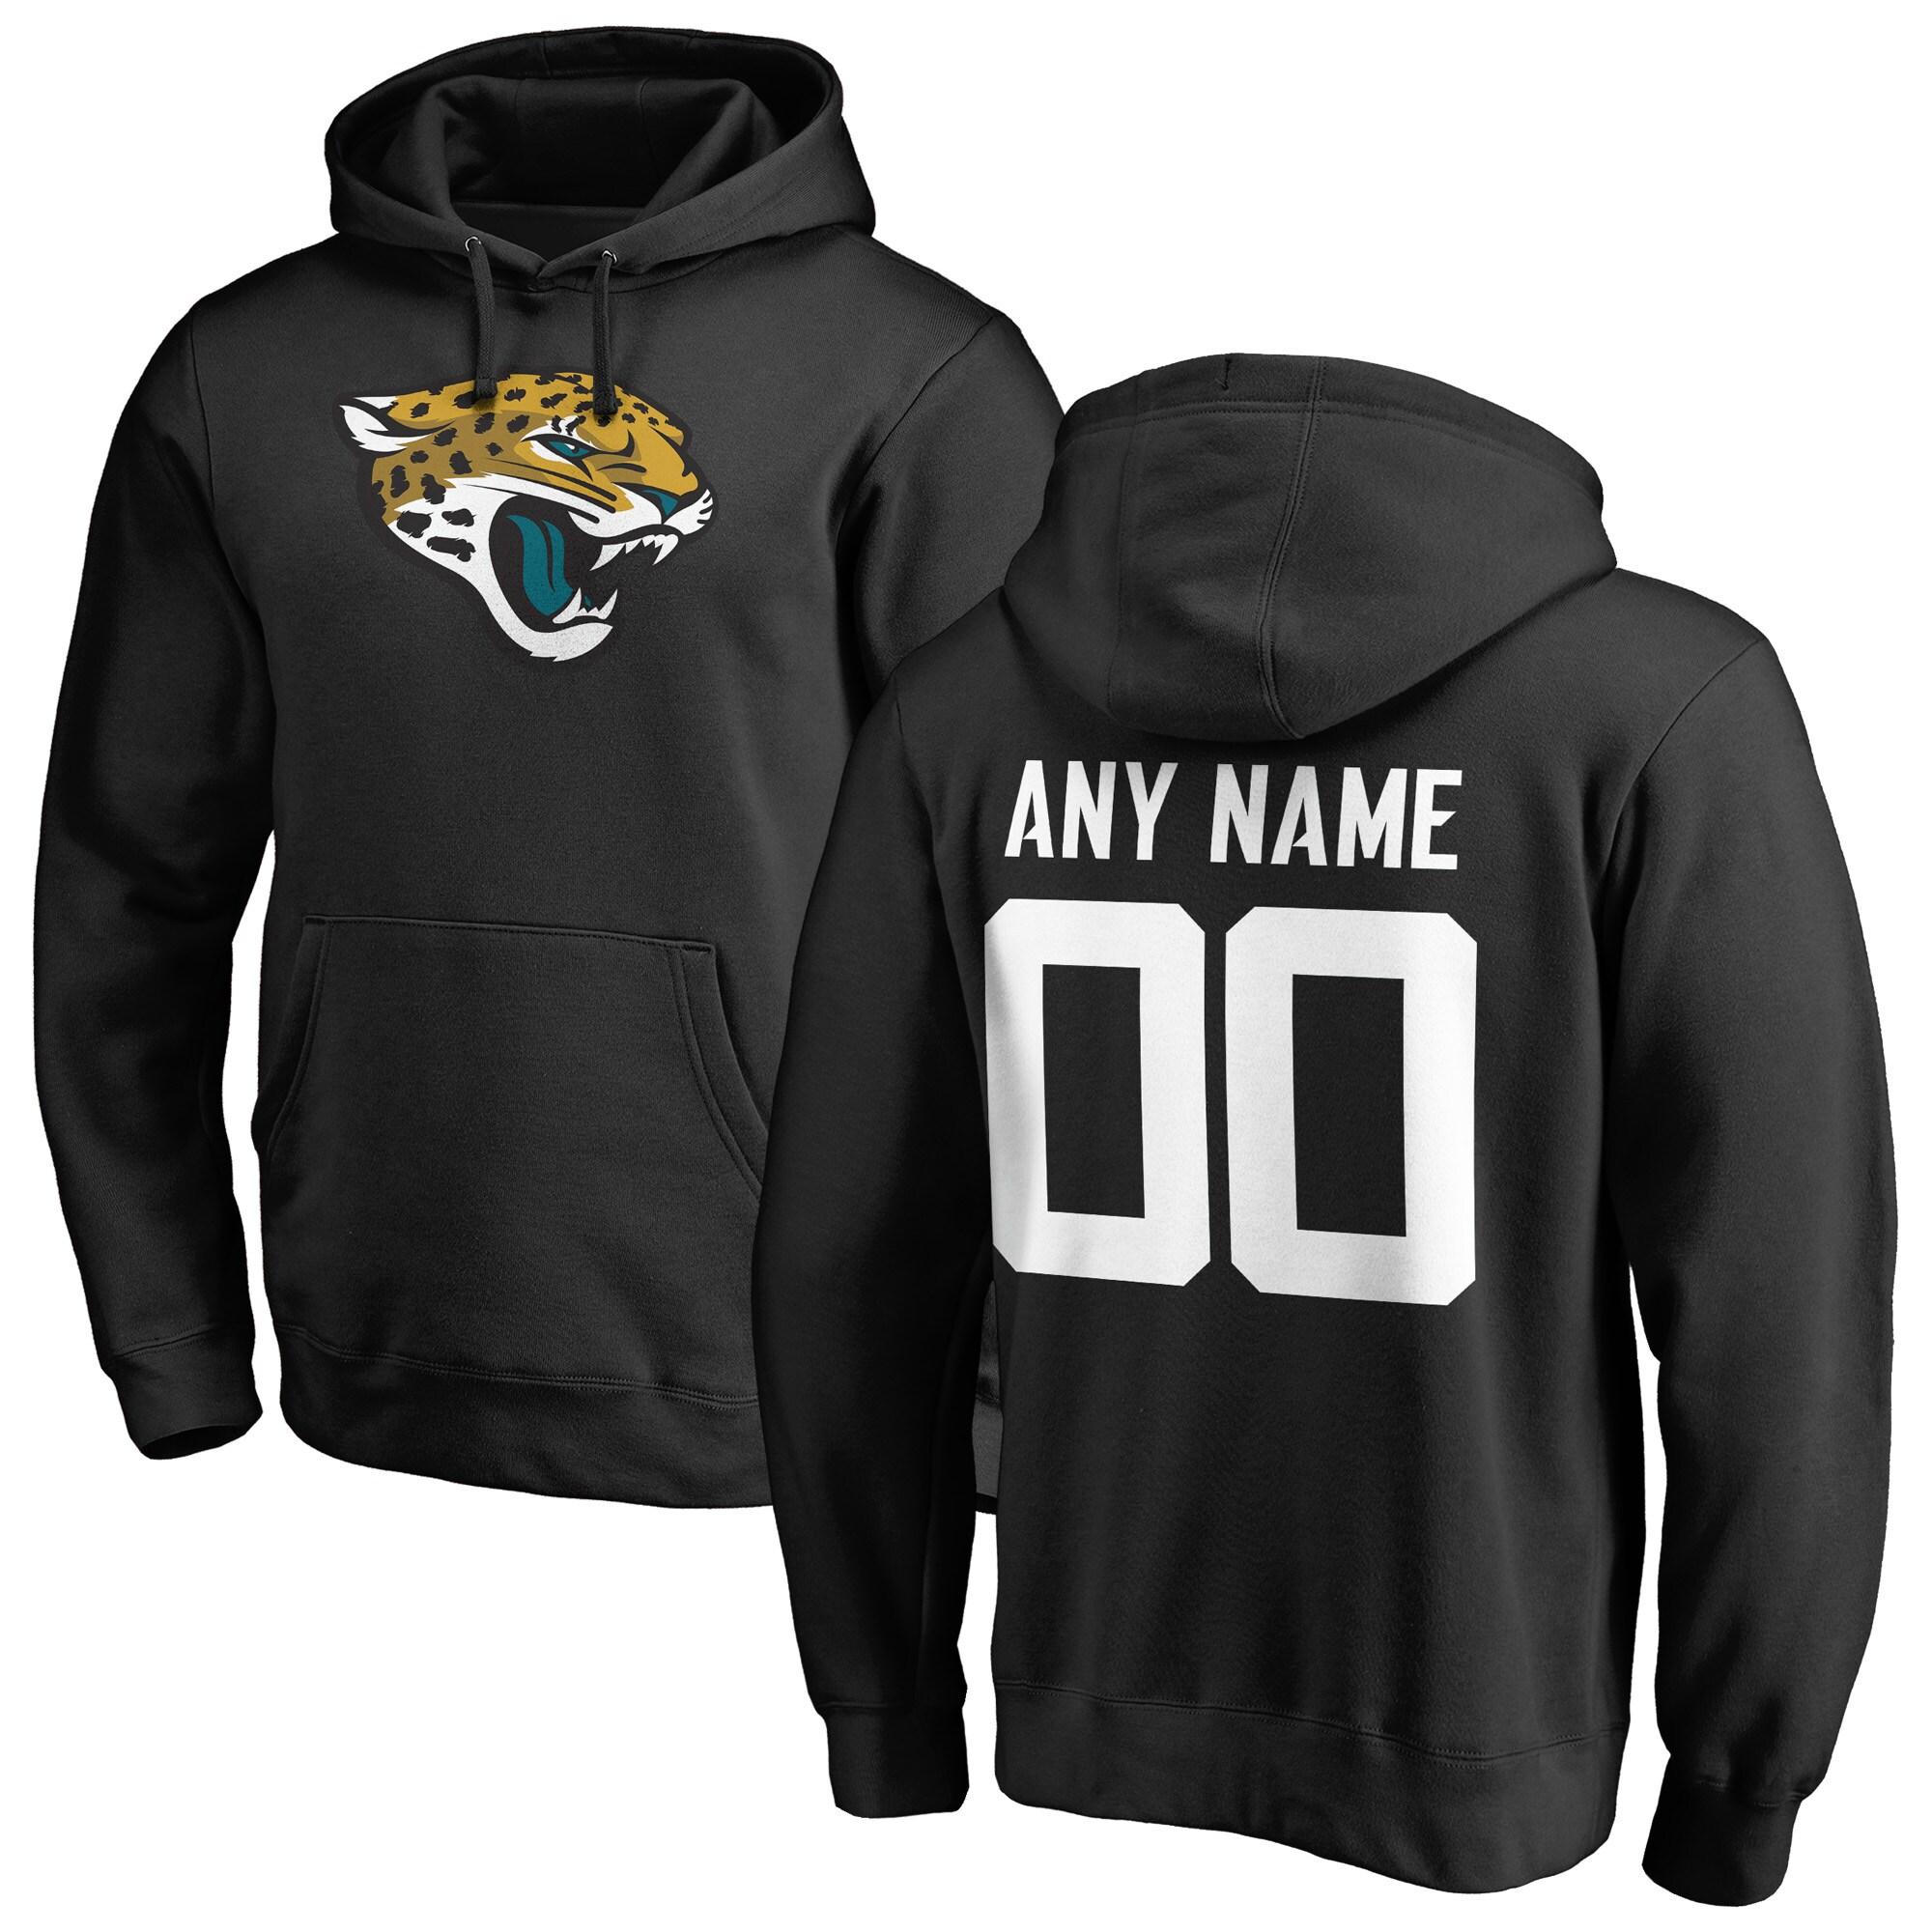 Jacksonville Jaguars NFL Pro Line Any Name & Number Logo Personalized Pullover Hoodie - Black